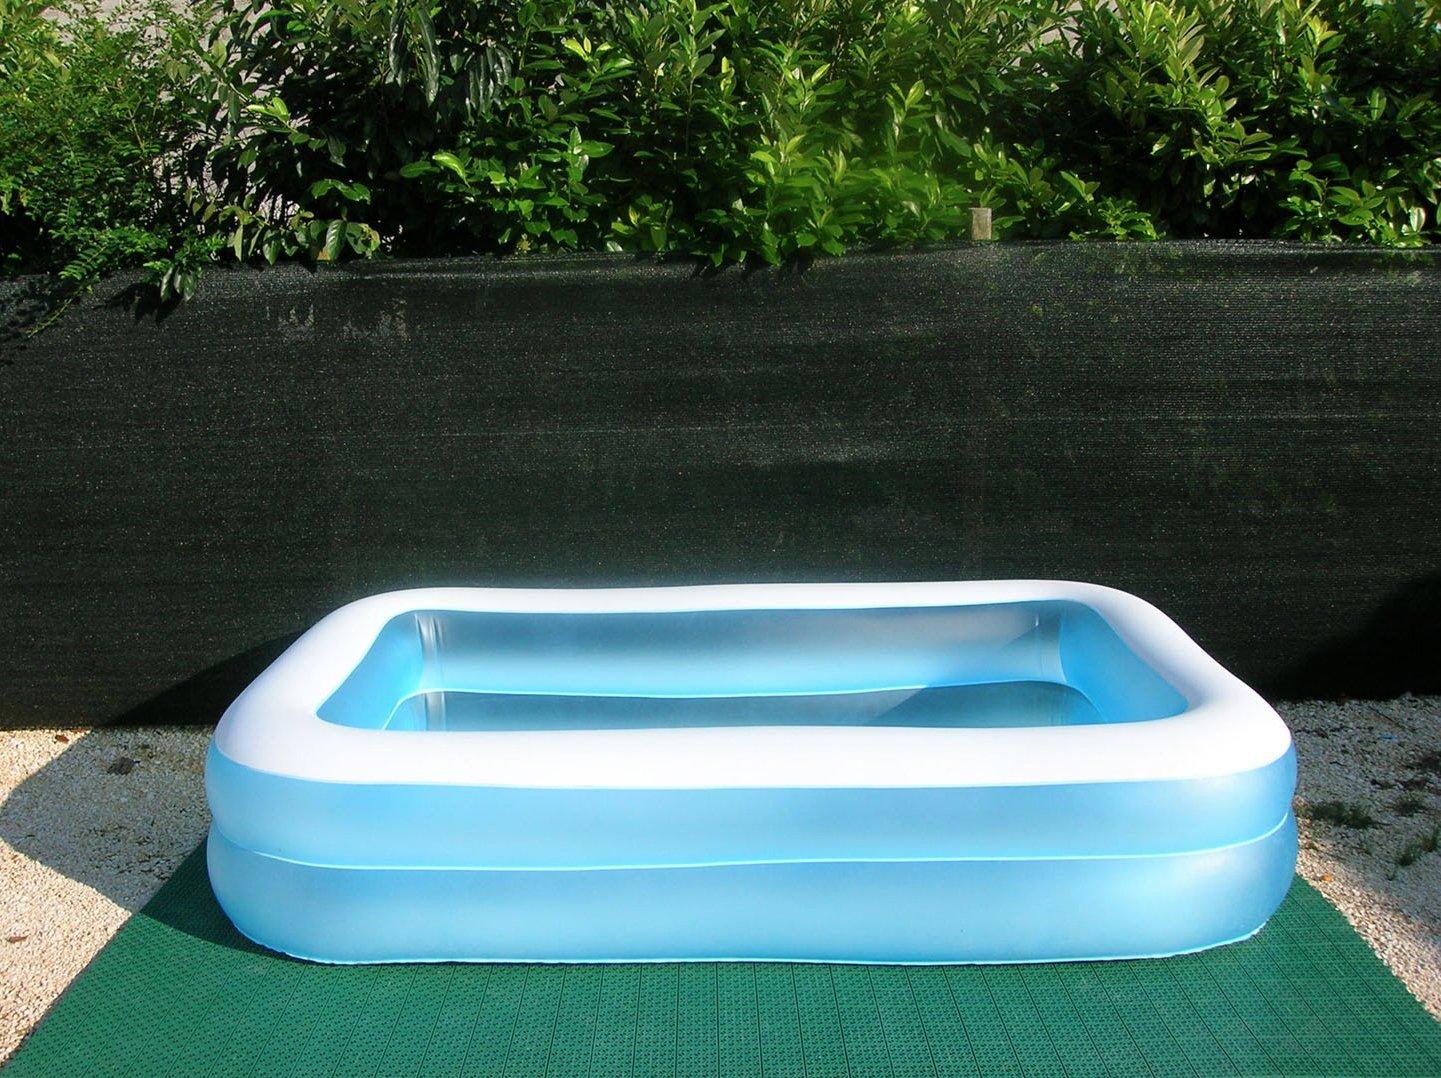 Multiplate 03mpve piastrelle flessibili plastica 55.5 x 55.5 cm